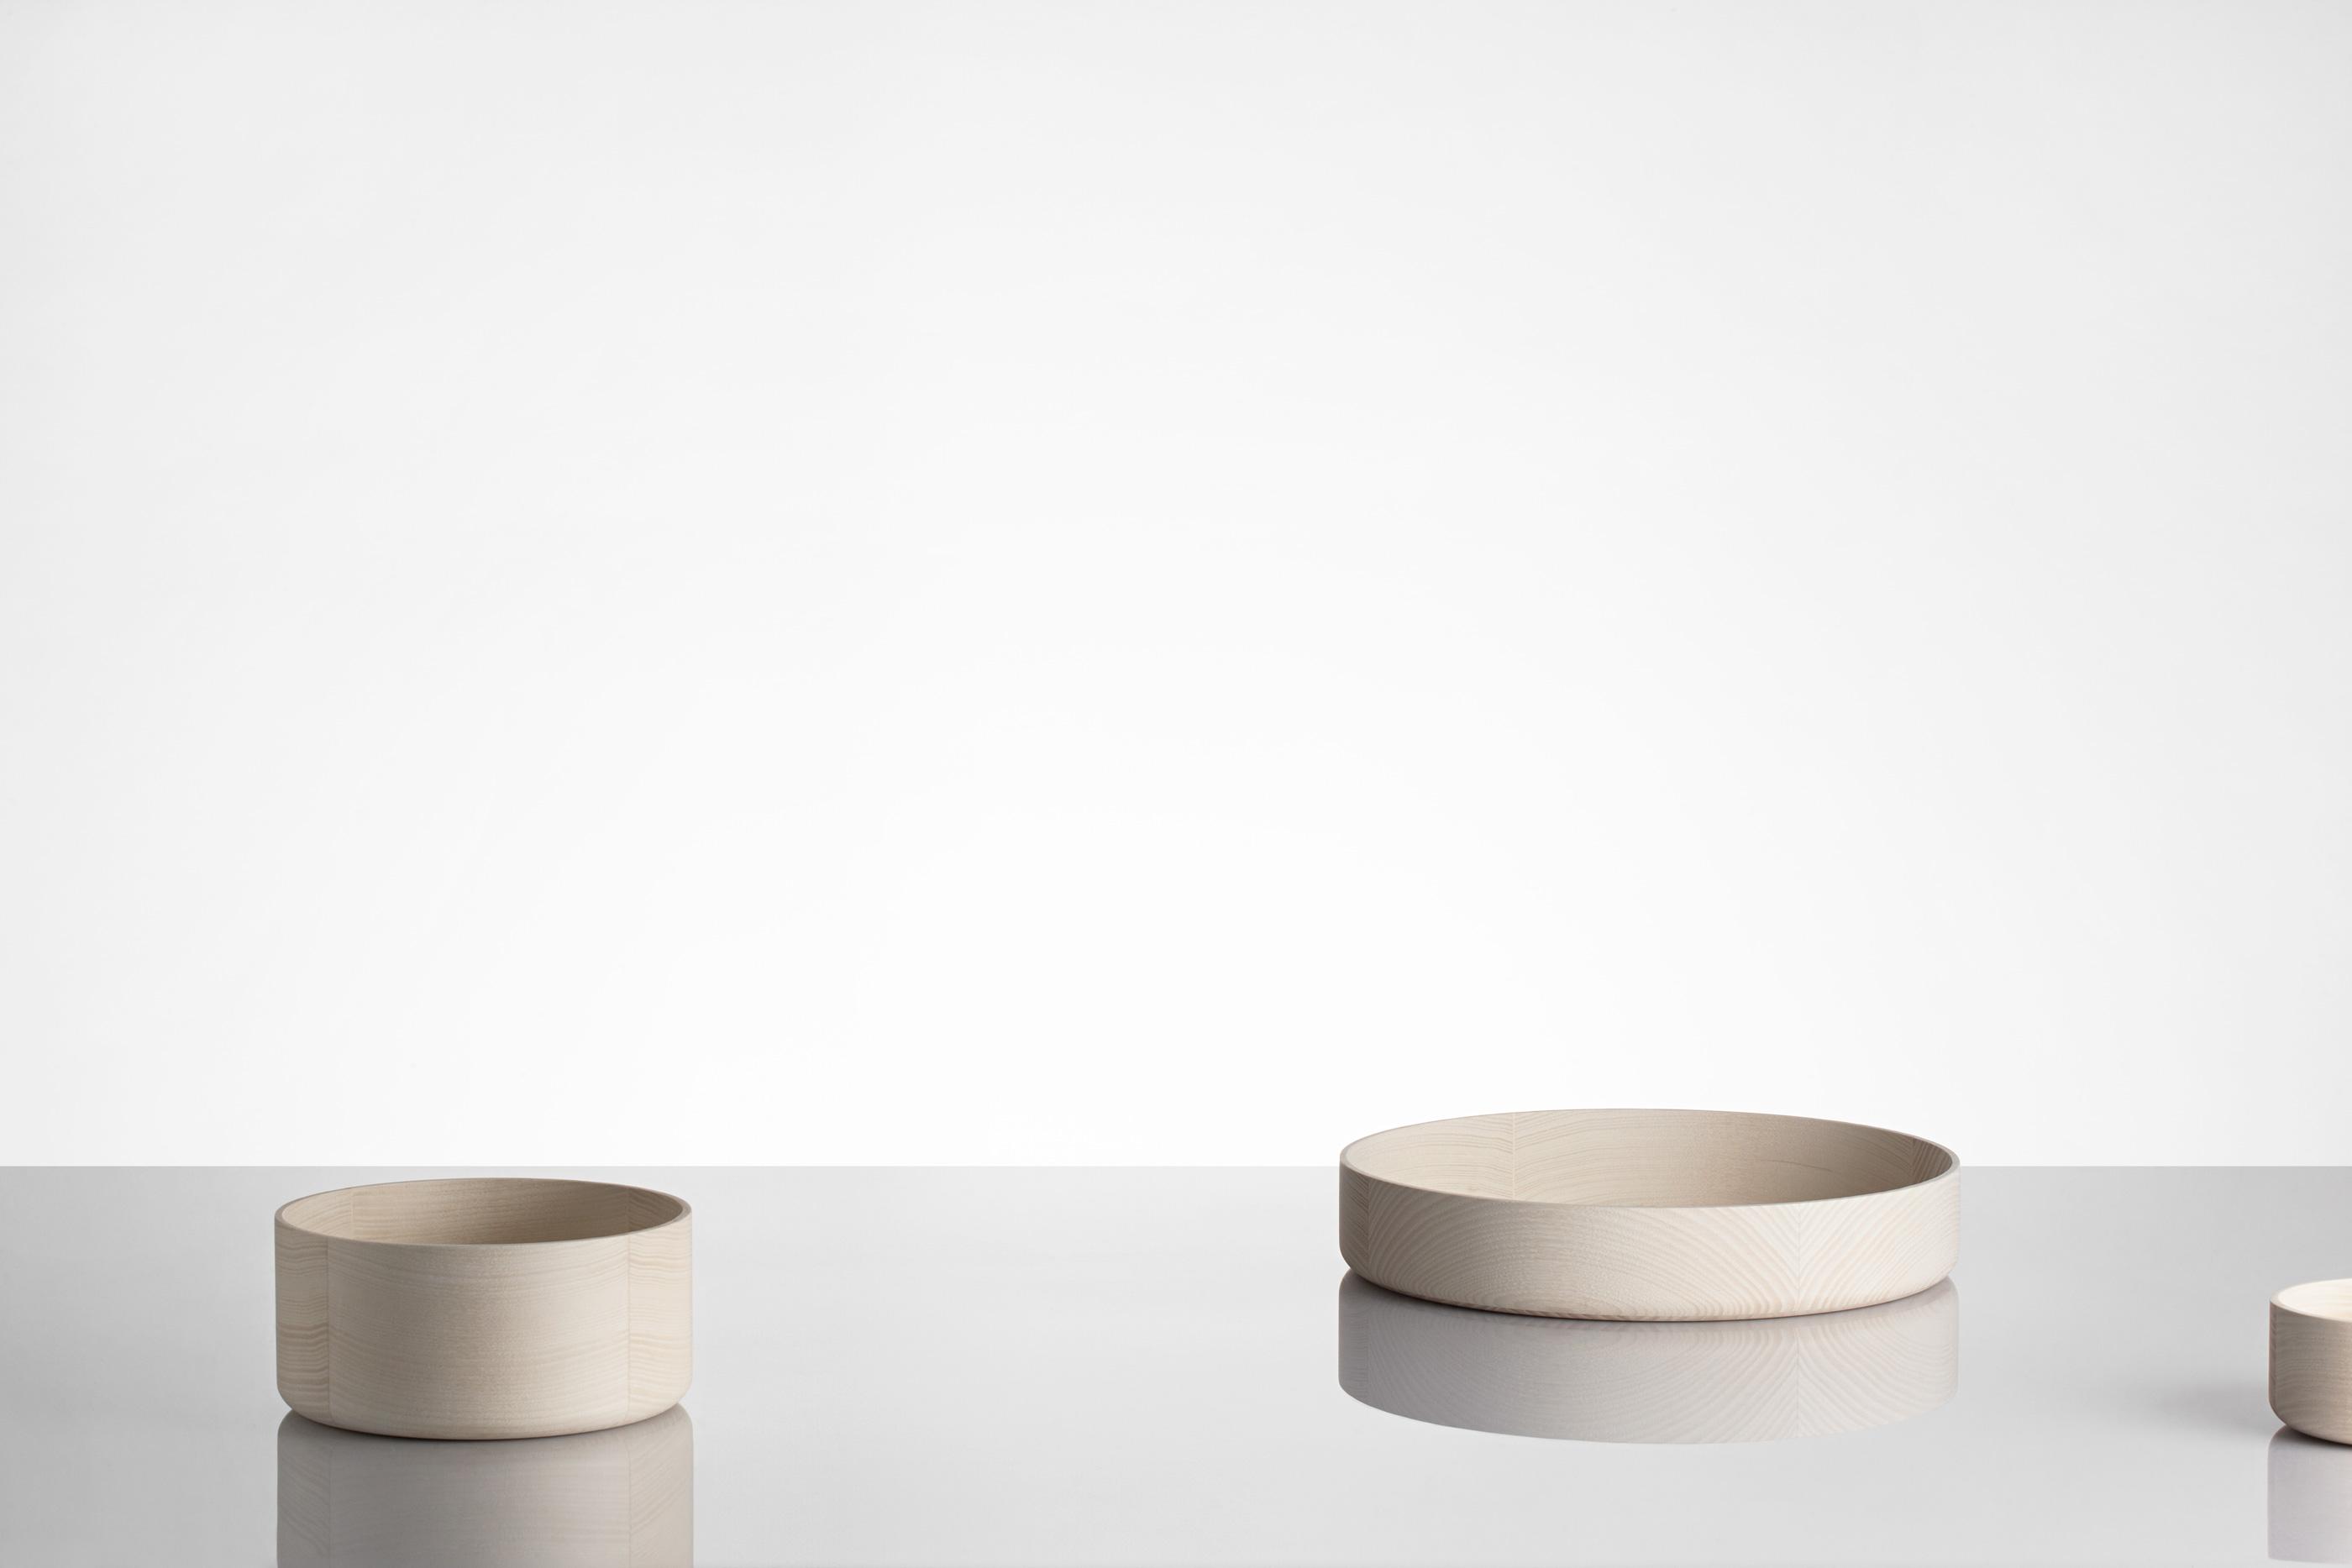 accessoires - Carlo Clopath Industrial Design